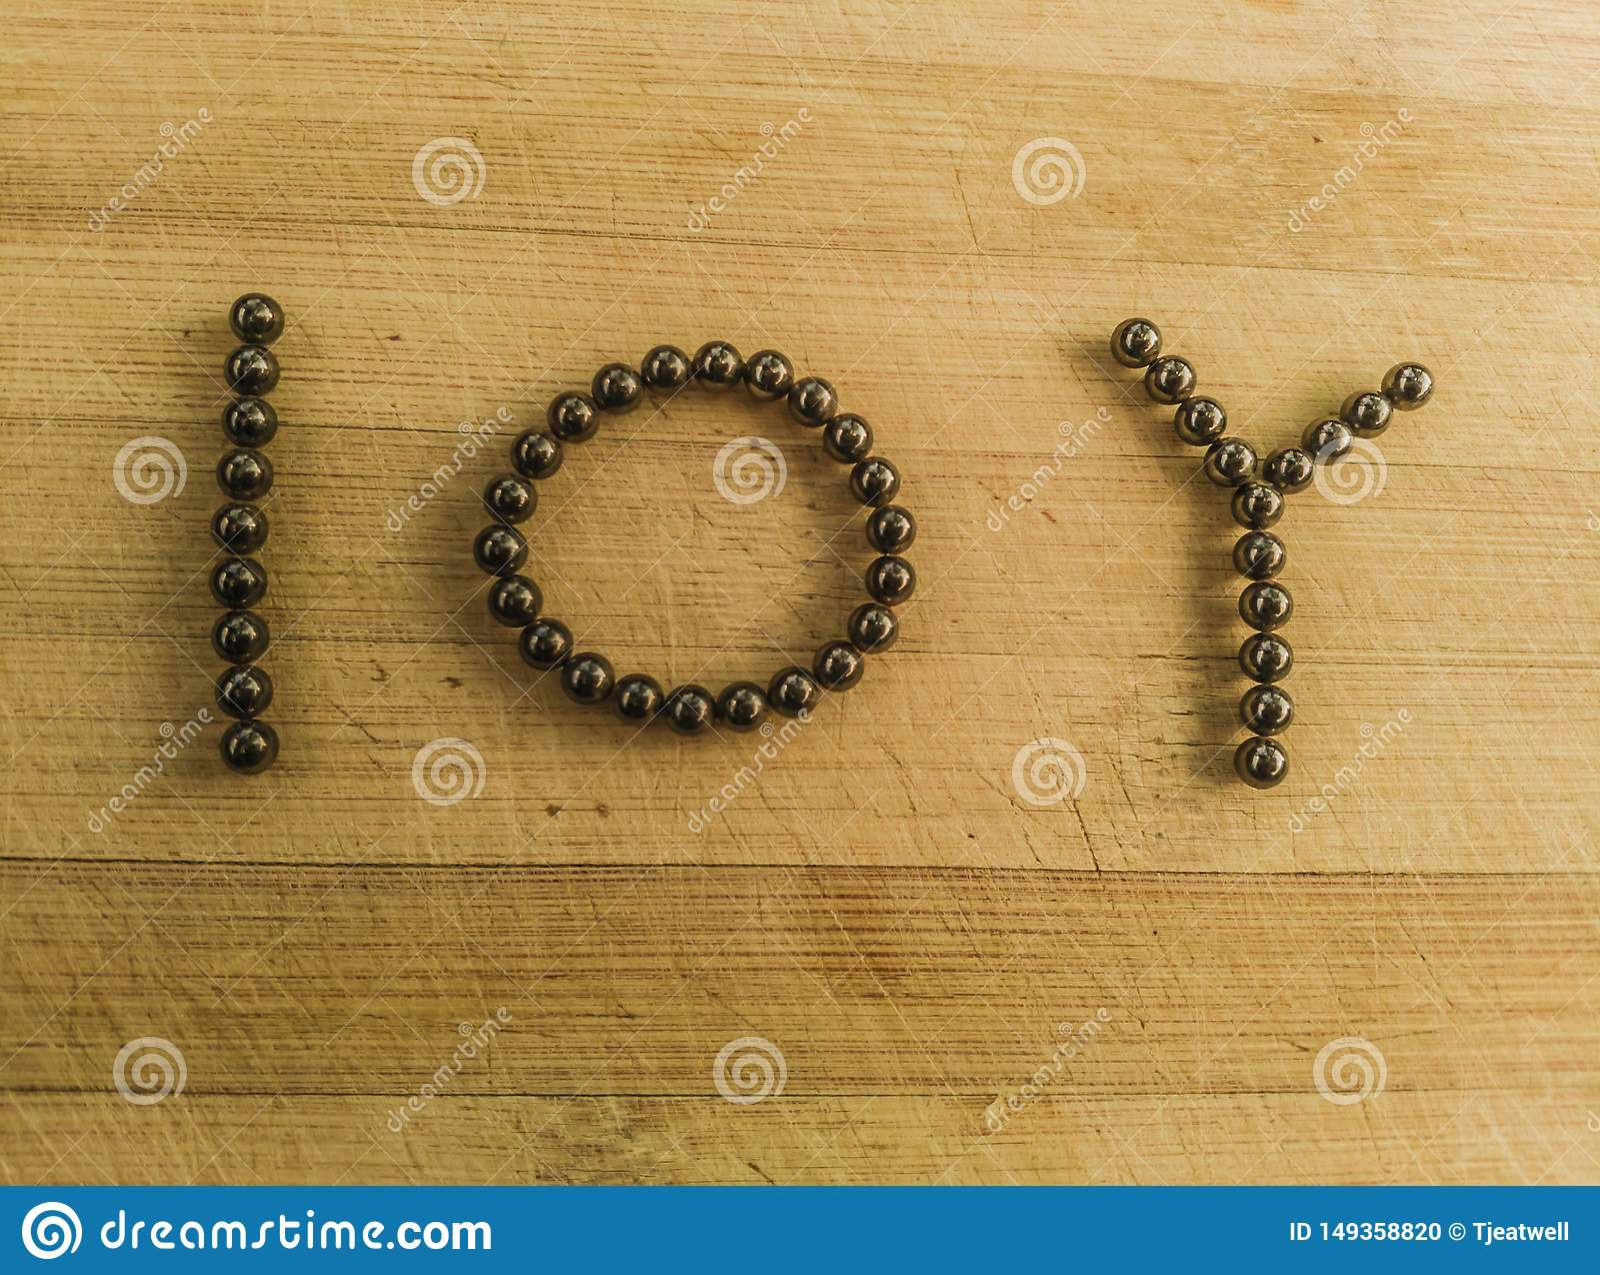 Financial ten year symbol in magnetic ball bearings